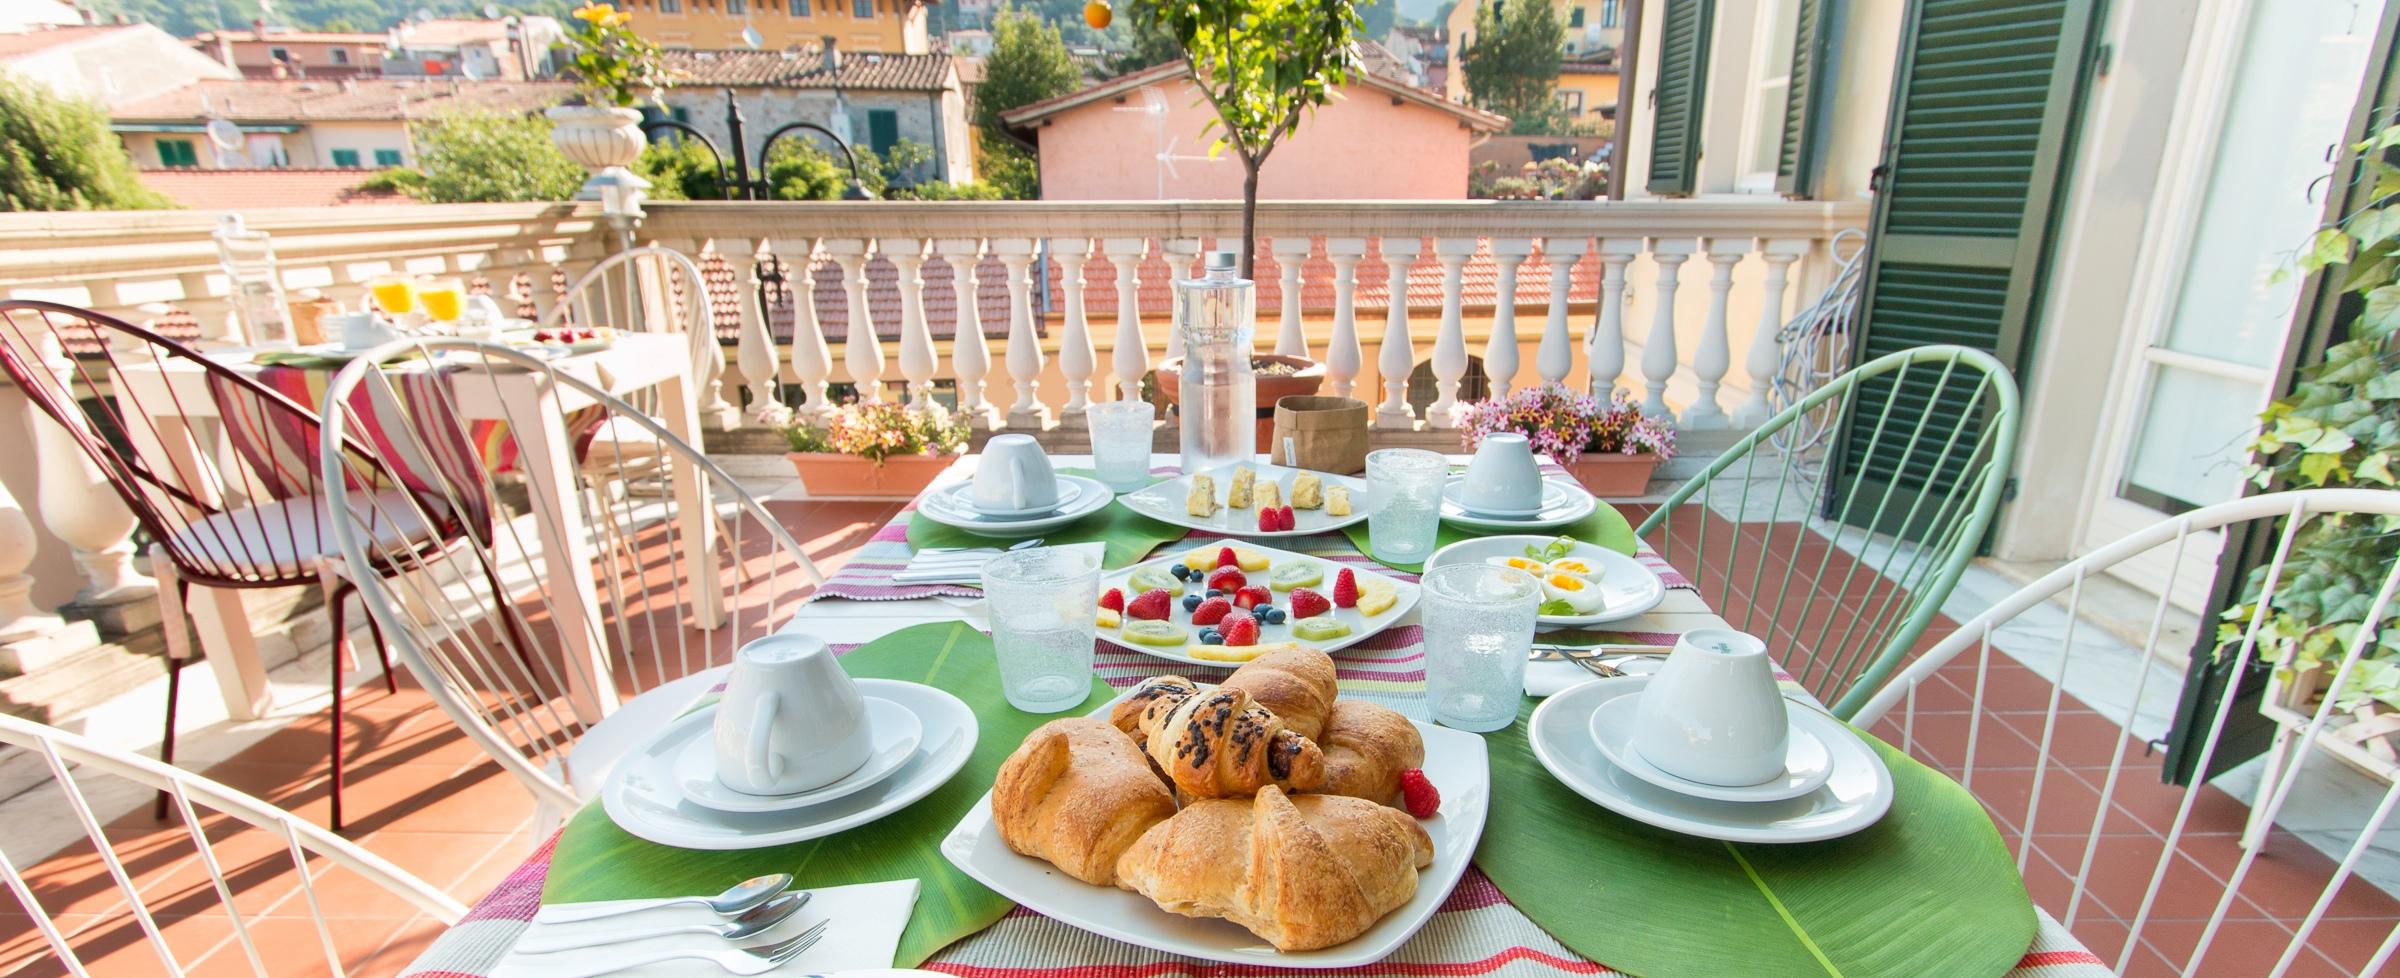 La-Sosta-degli-Artisti-Bed-Breakfast-6